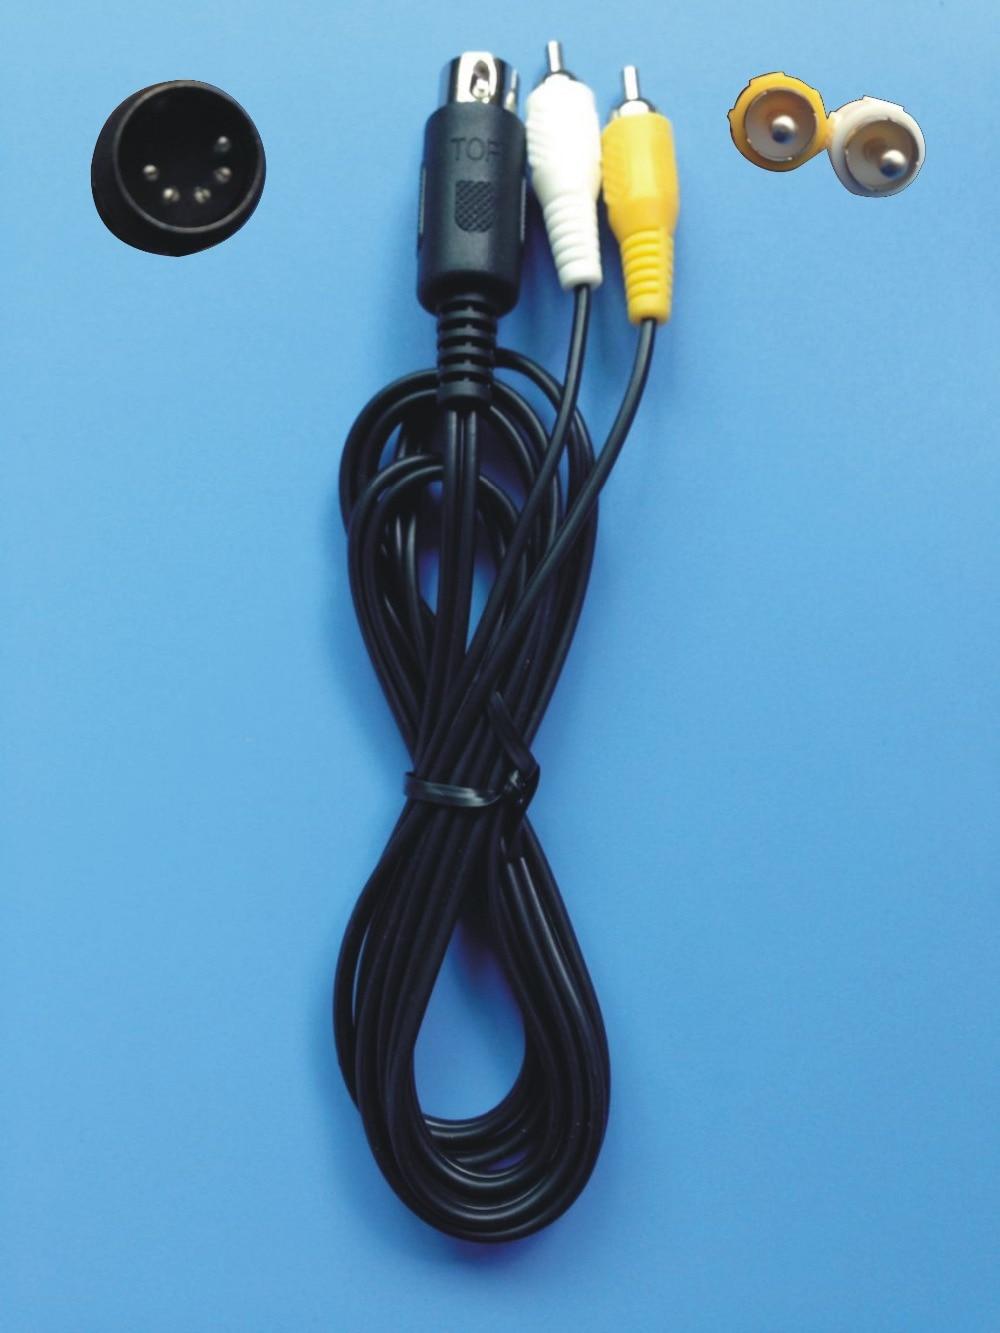 font b Audio b font Video AV Cable Cord Sega Genesis I 1 One